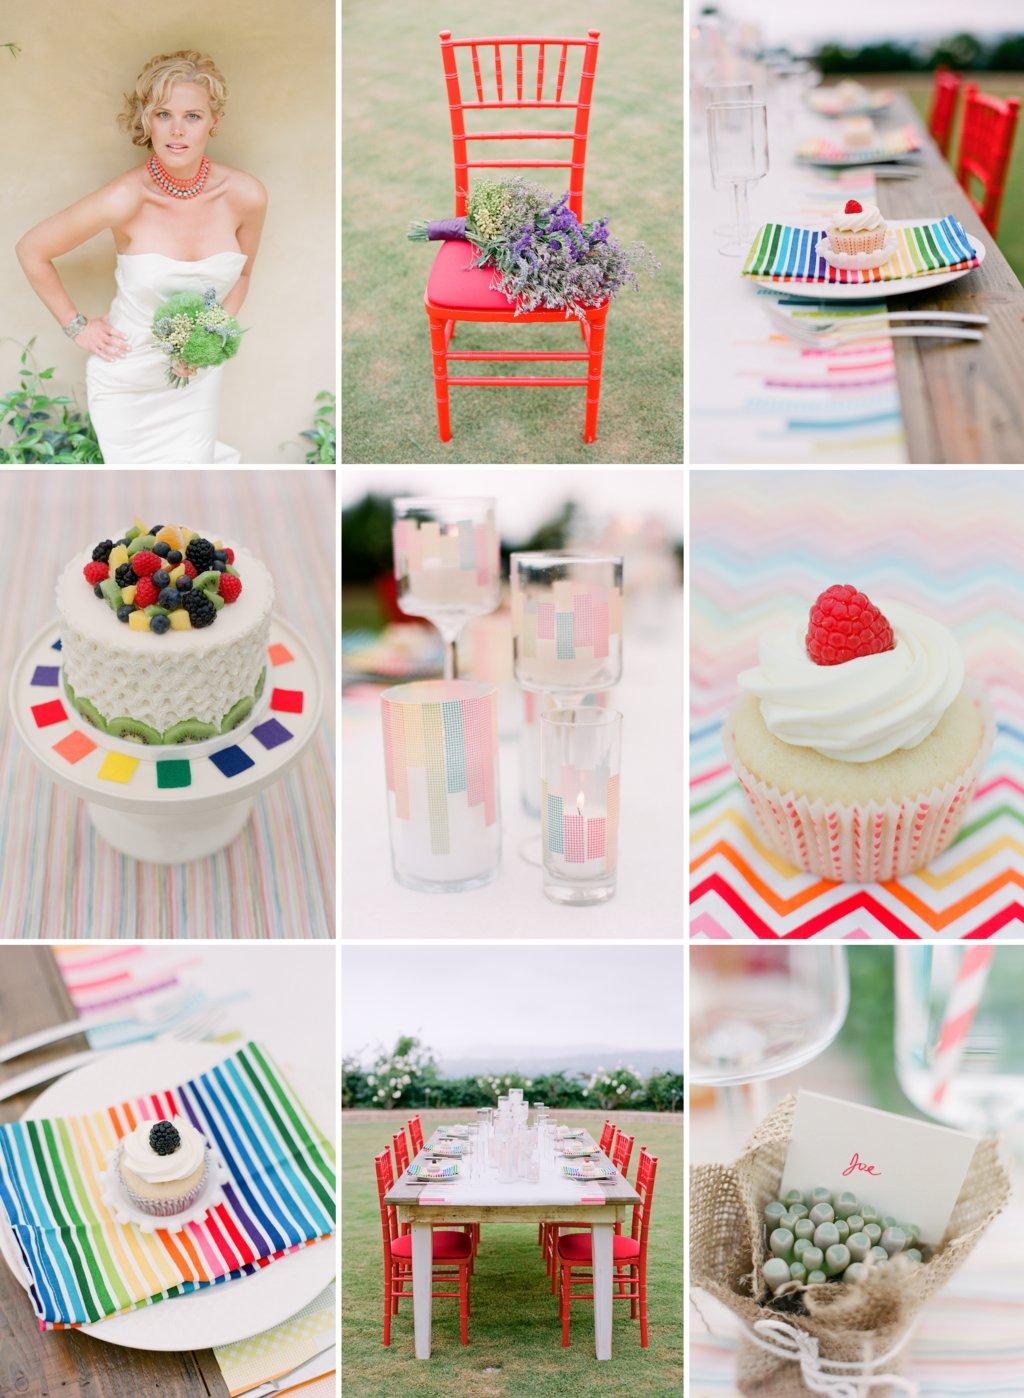 Bright-wedding-color-inspiration-rainbow-weddings-outdoor-reception-shoot-1.full